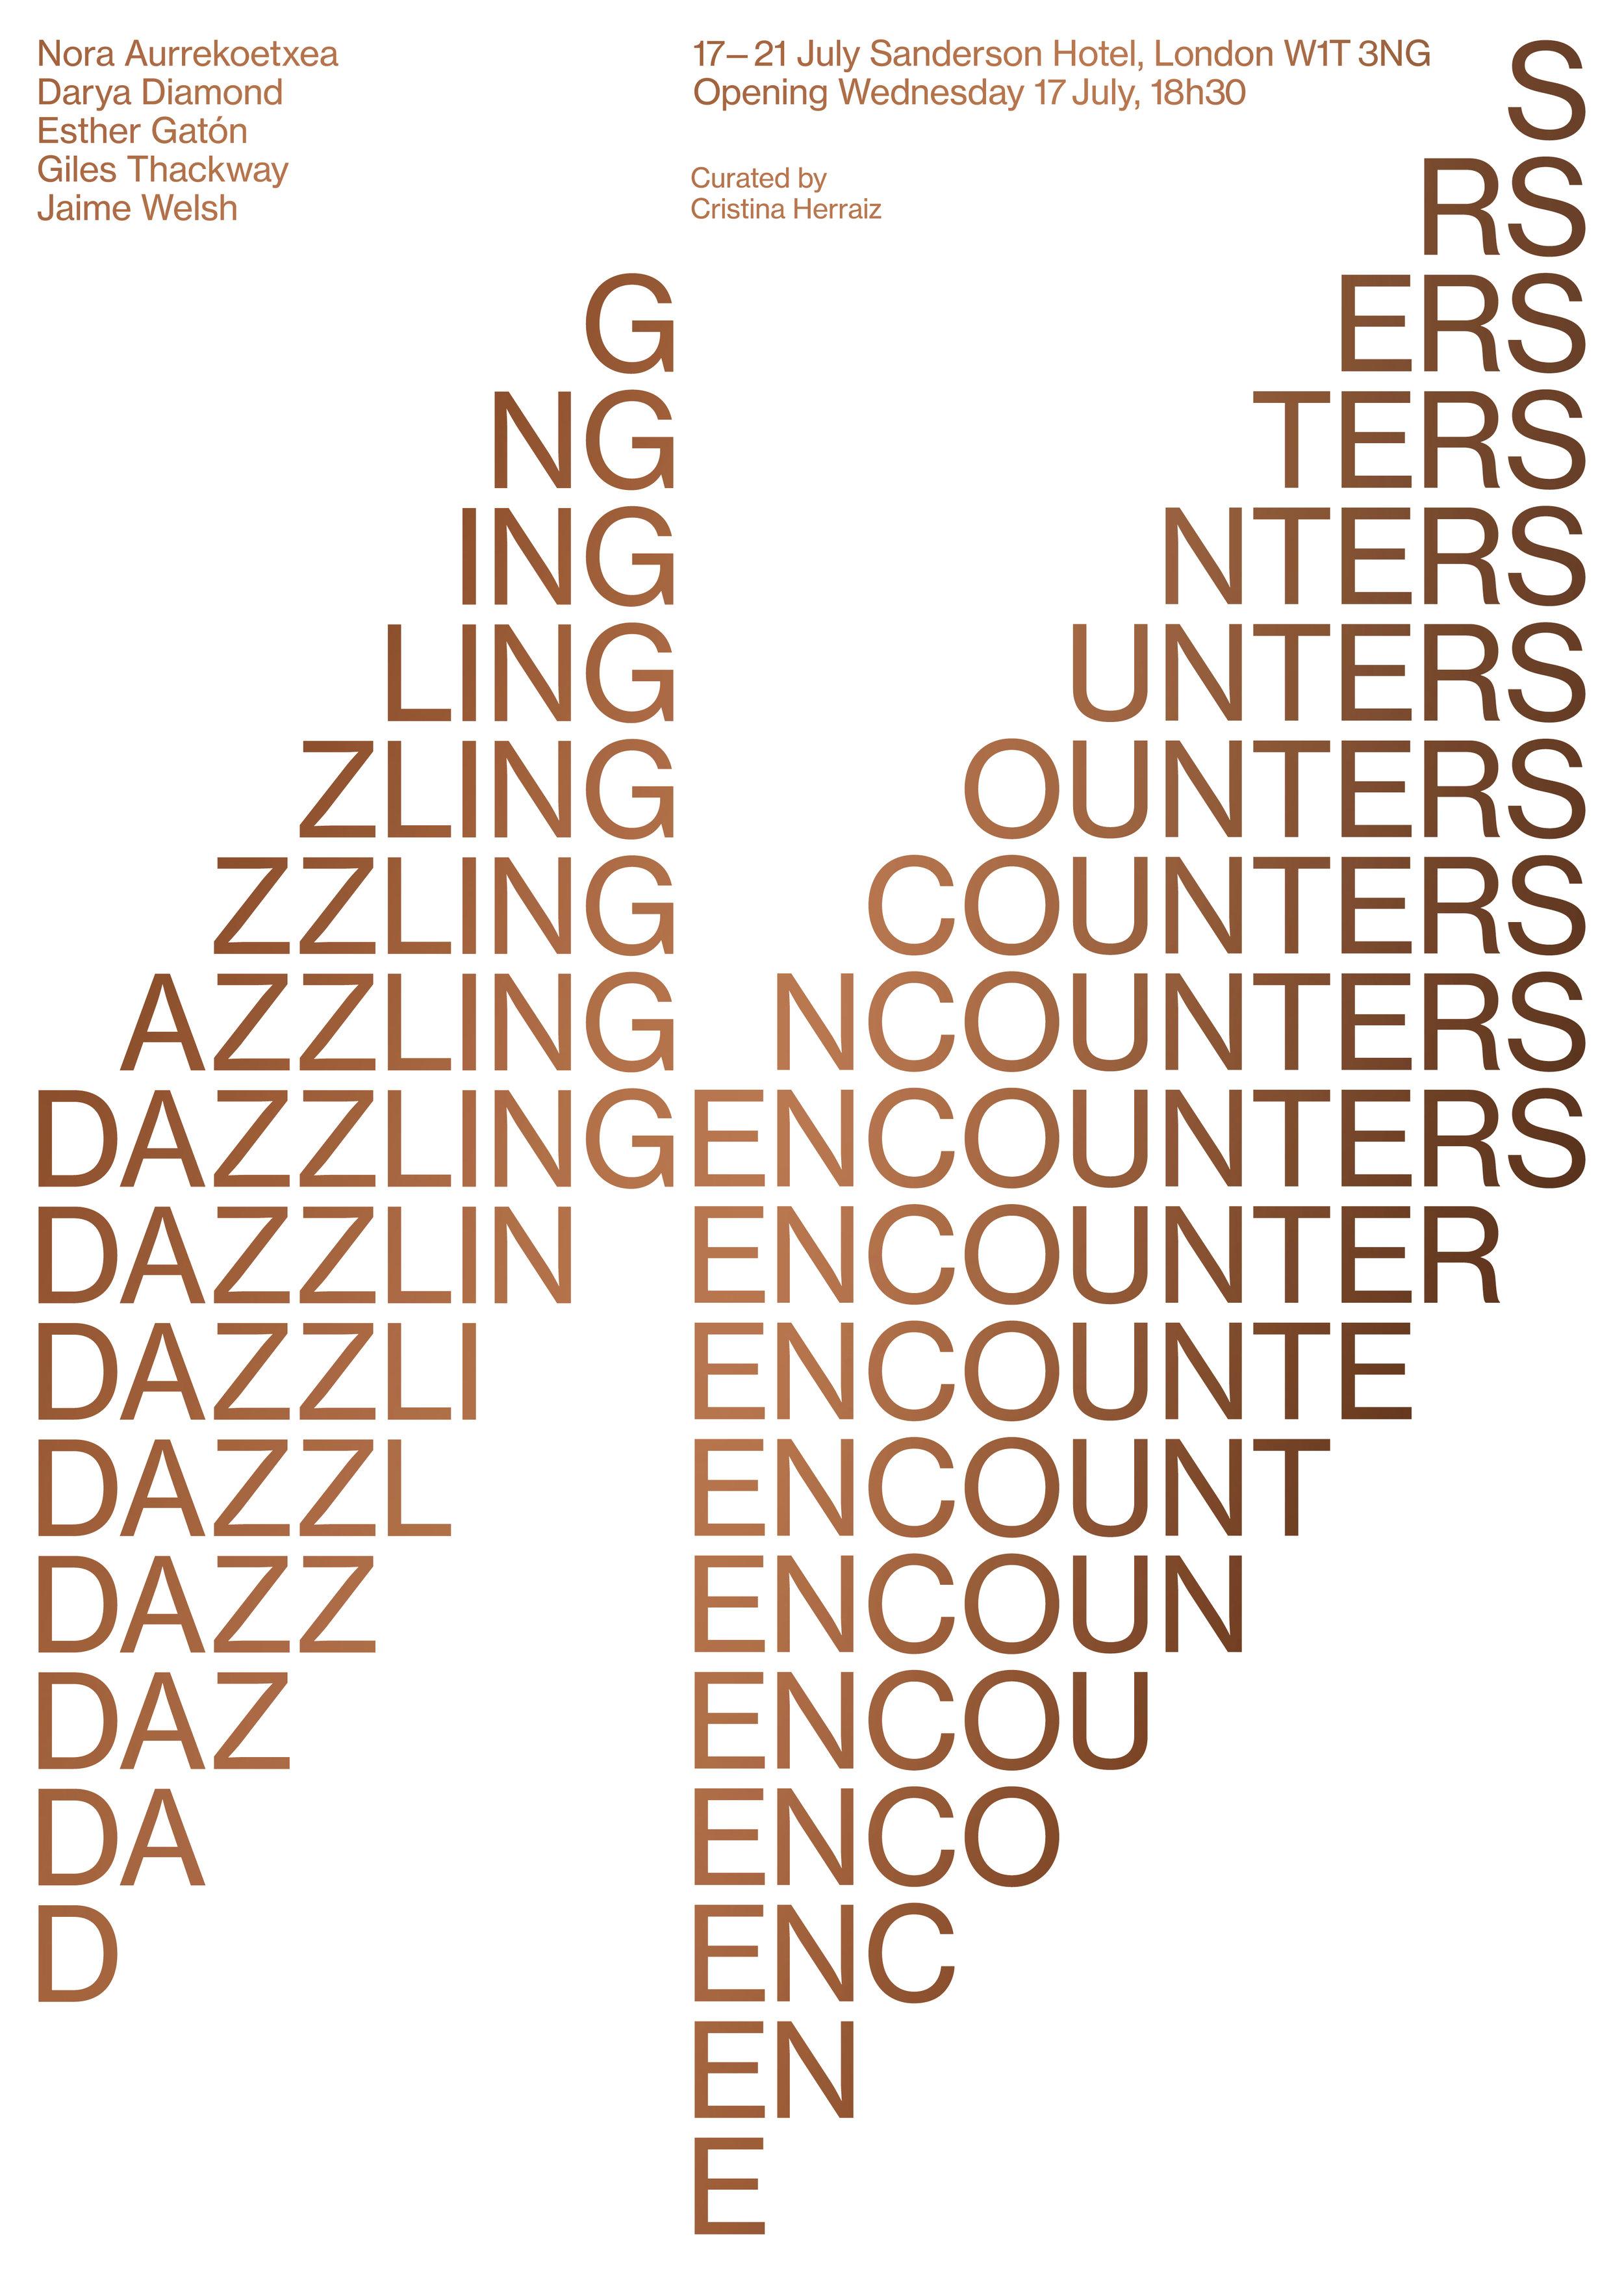 Dazzling Encounters_Poster.jpg